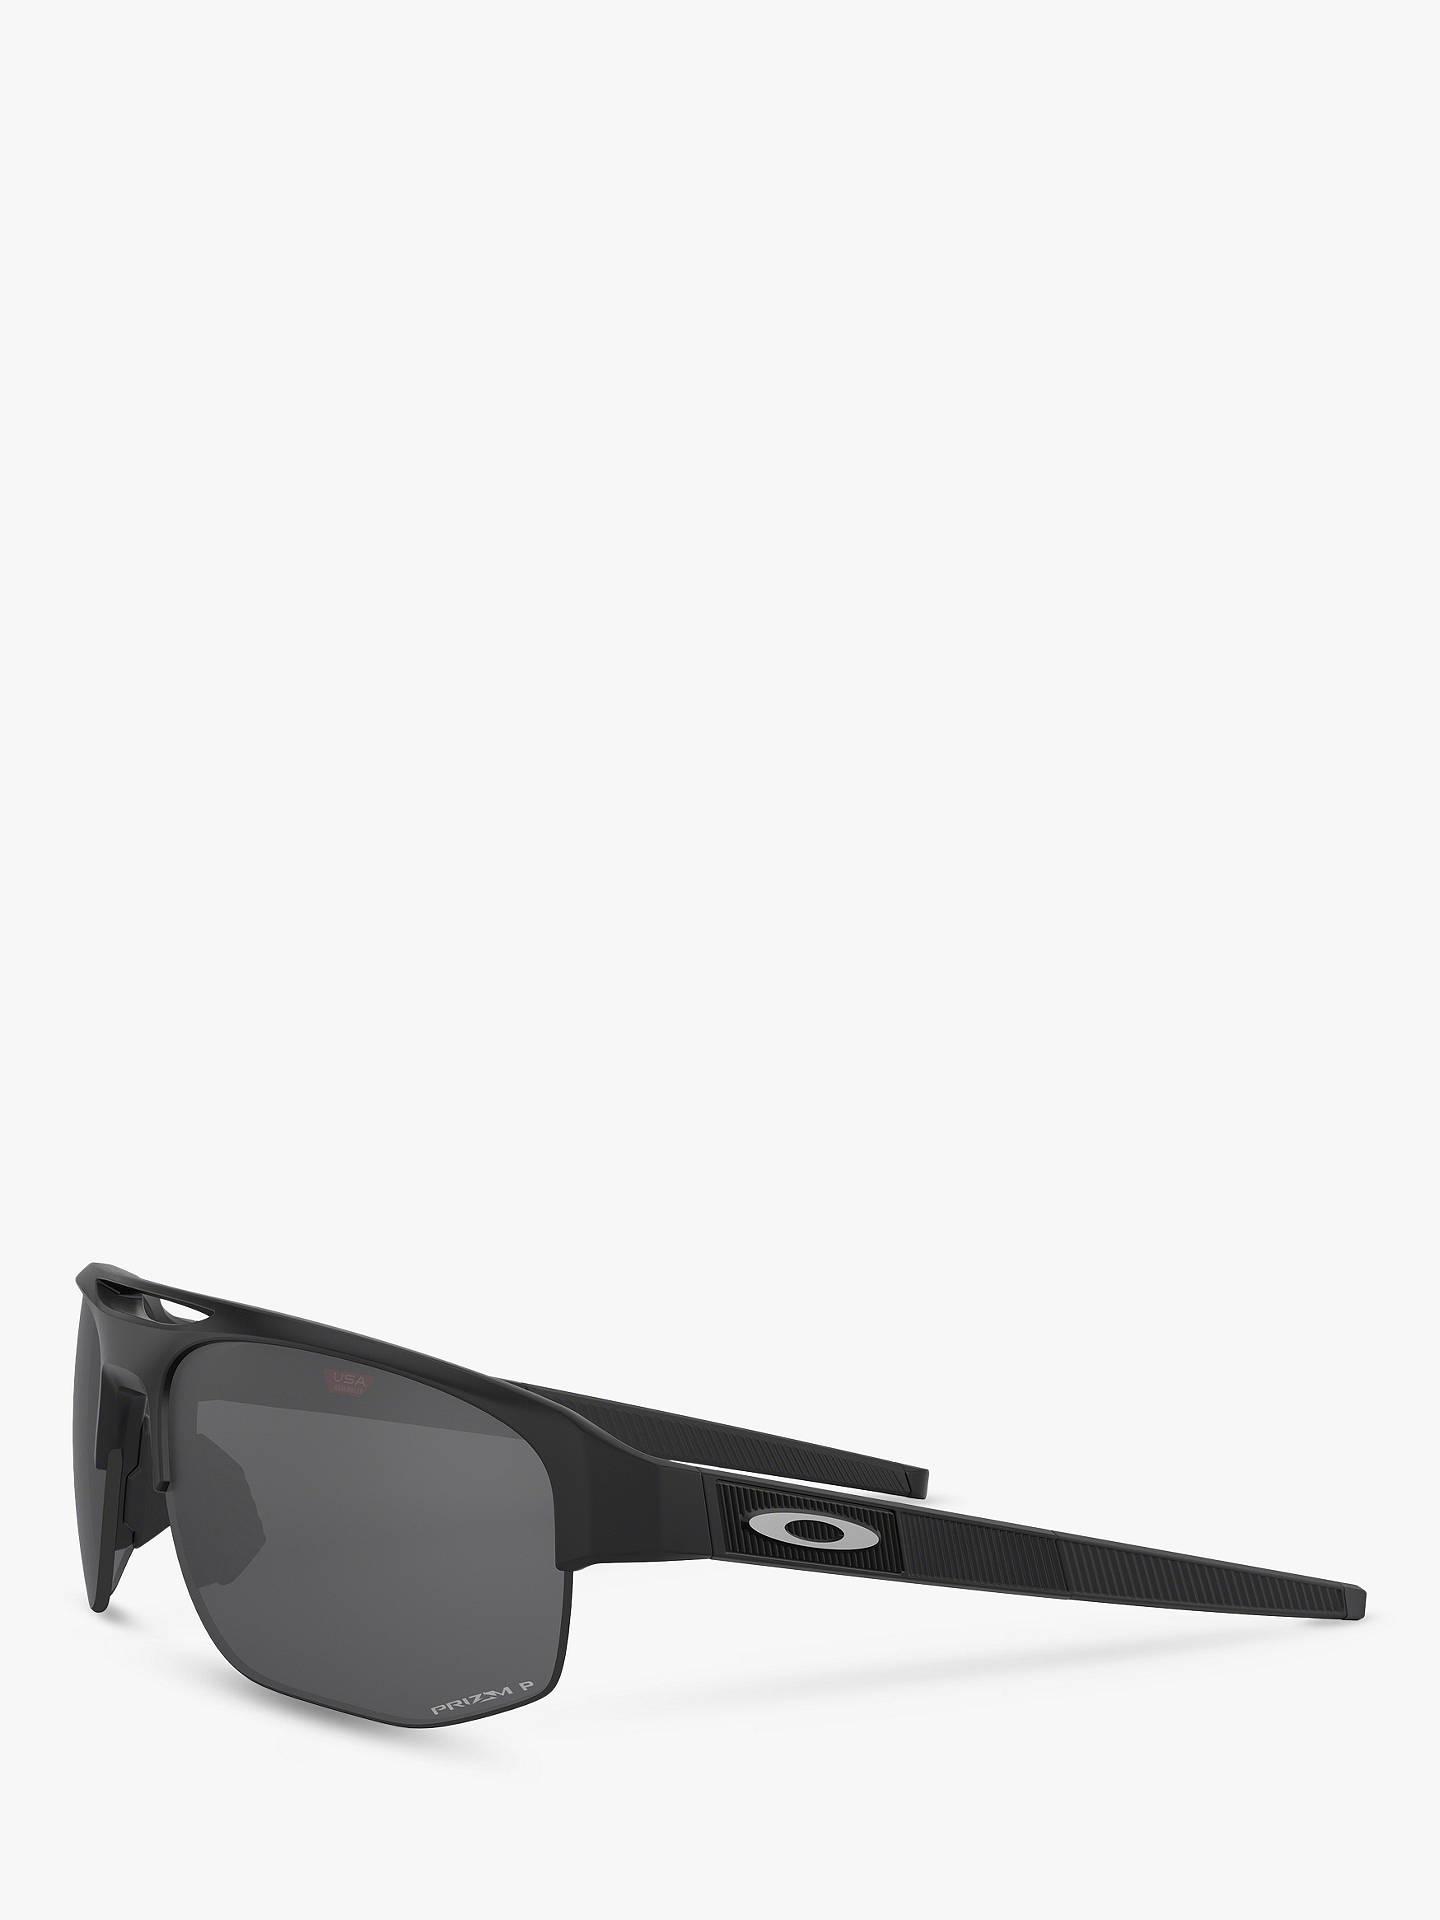 974d05e2cdc9 ... Buy Oakley OO9424 Men s Mercenary Prizm Polarised Rectangular Sunglasses